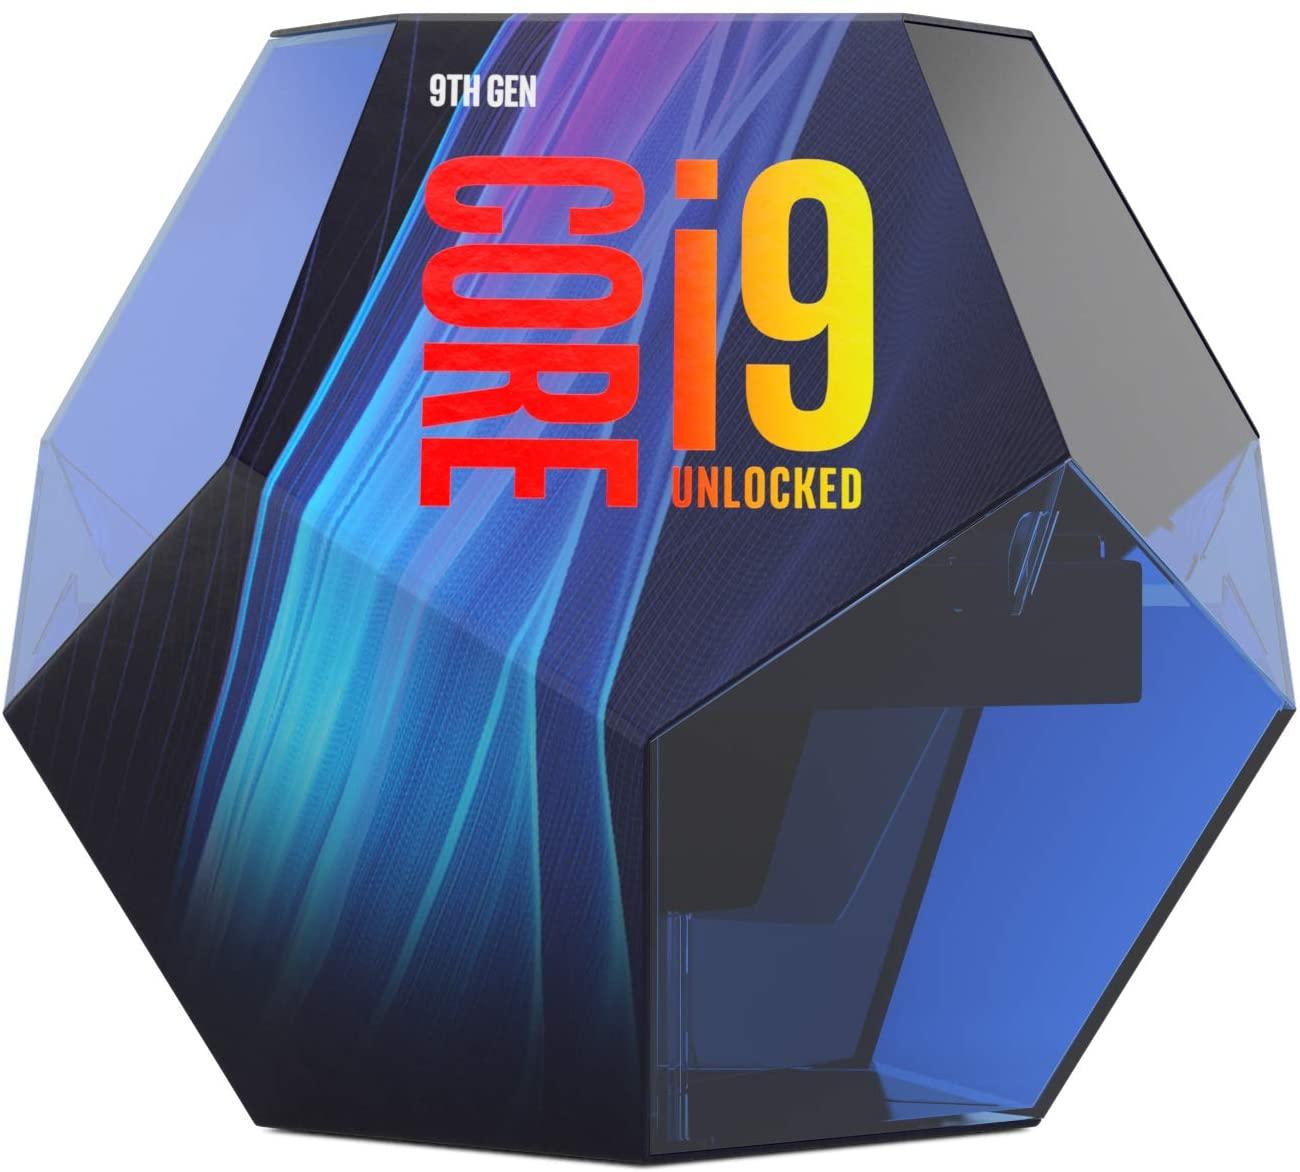 intel core i9 9900k image